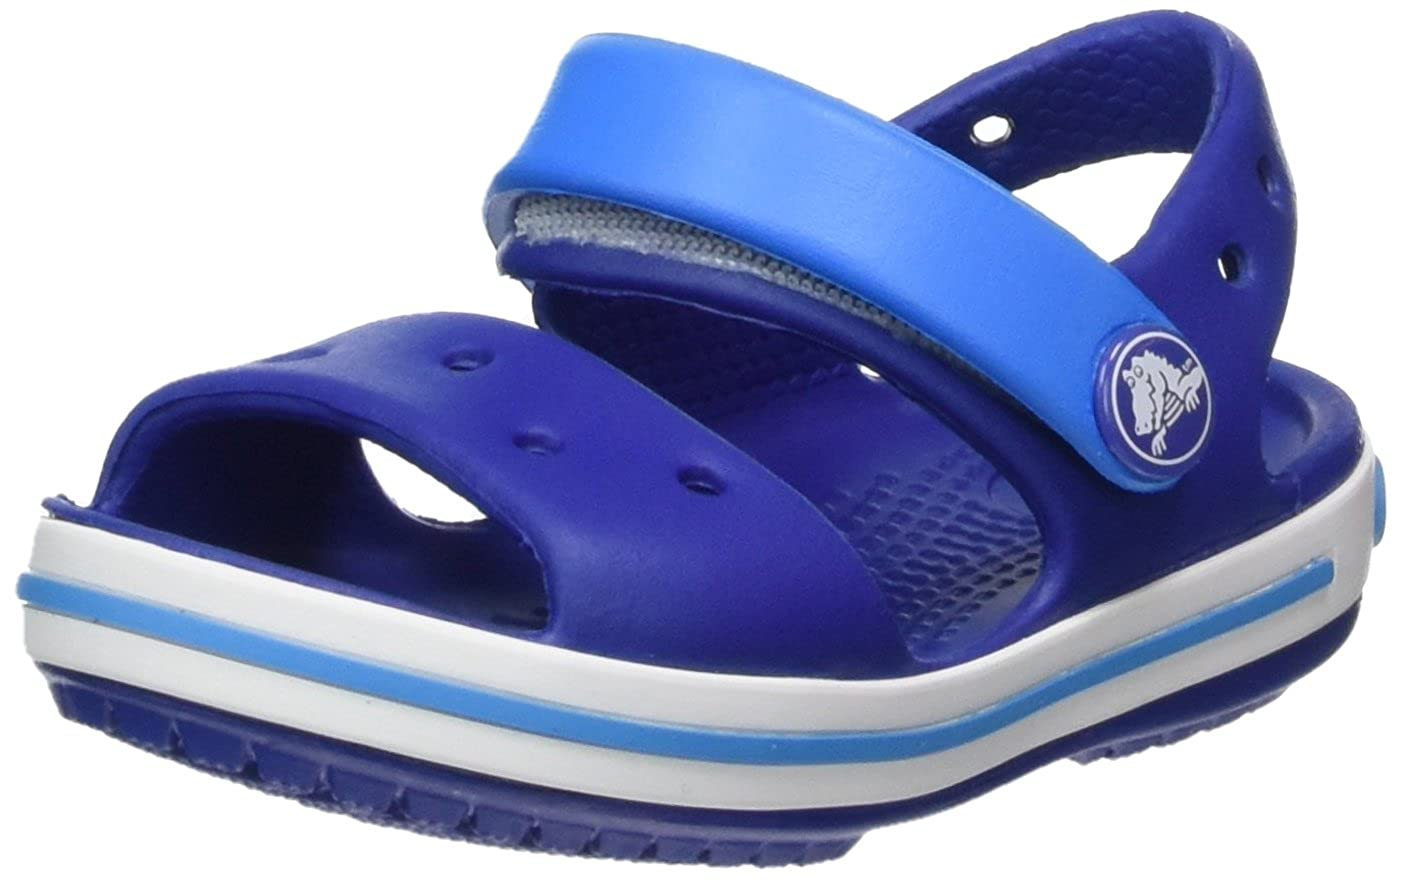 Crocs Crocband Sandal-Kids, Mixte Enfant